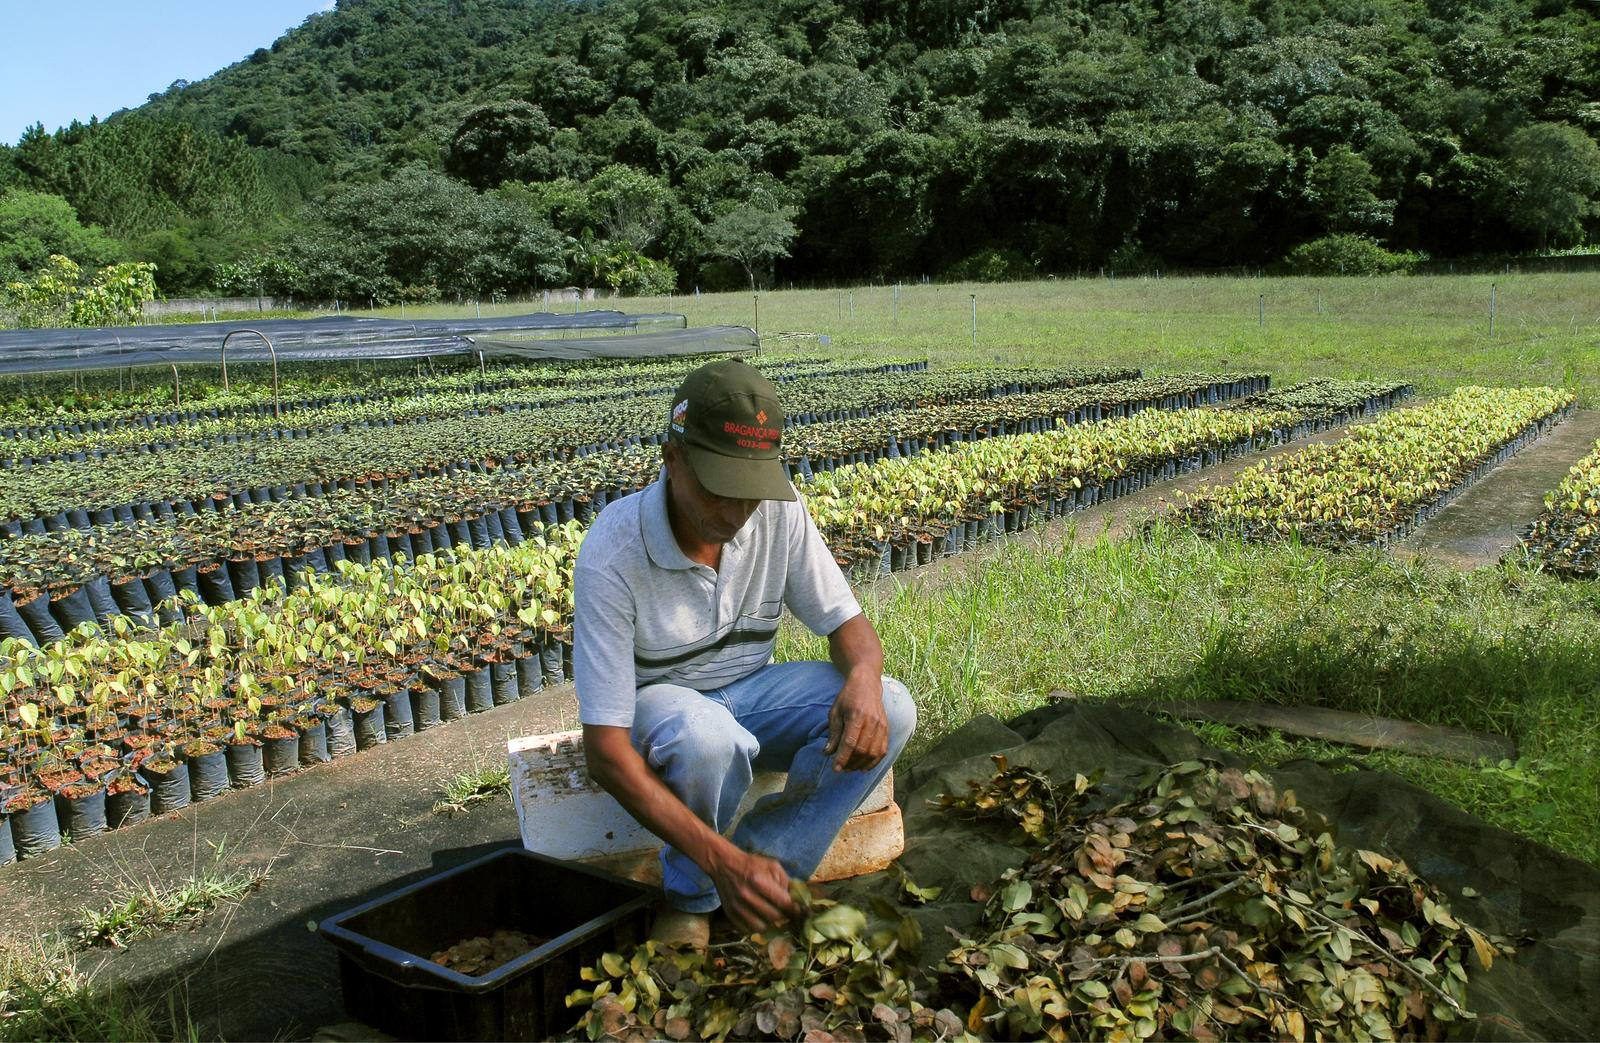 ecosia-tree-planting-brazil-atlantic-forest-02